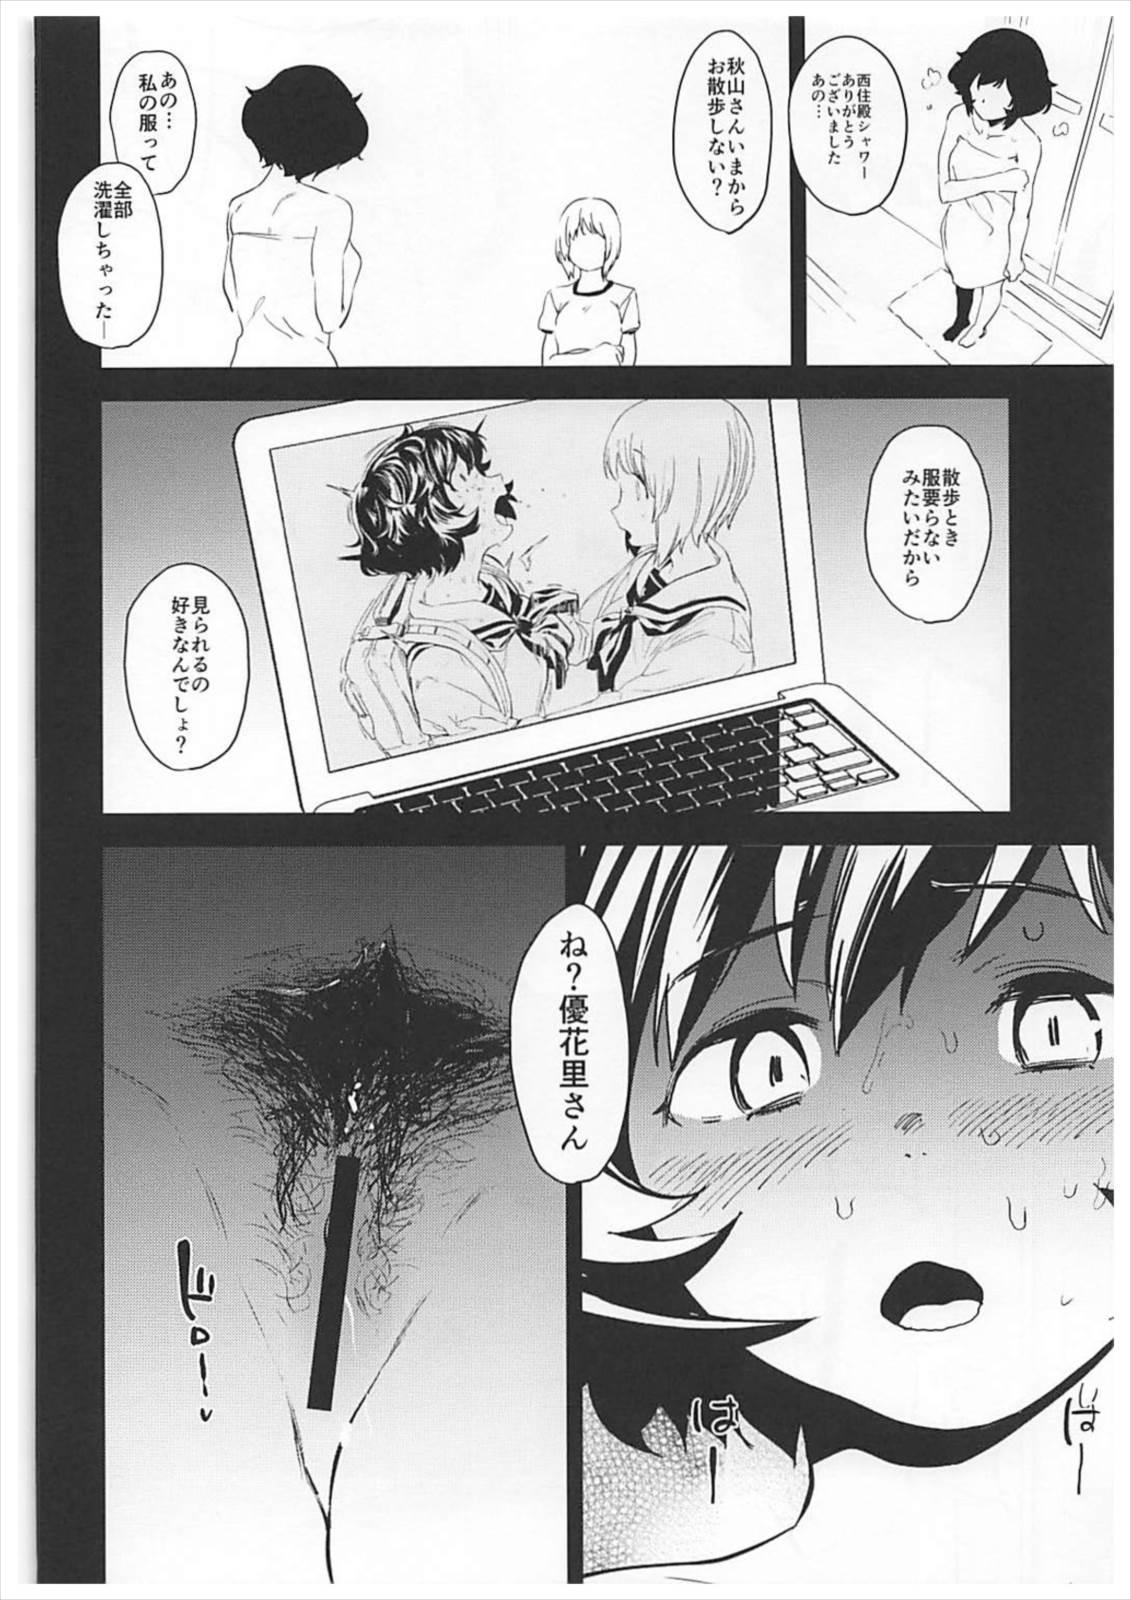 (Panzer Vor! 13) [Camrism (Kito Sakeru)] Private Akiyama 2 - Nishizumi-san to Issho (Girls und Panzer) 22